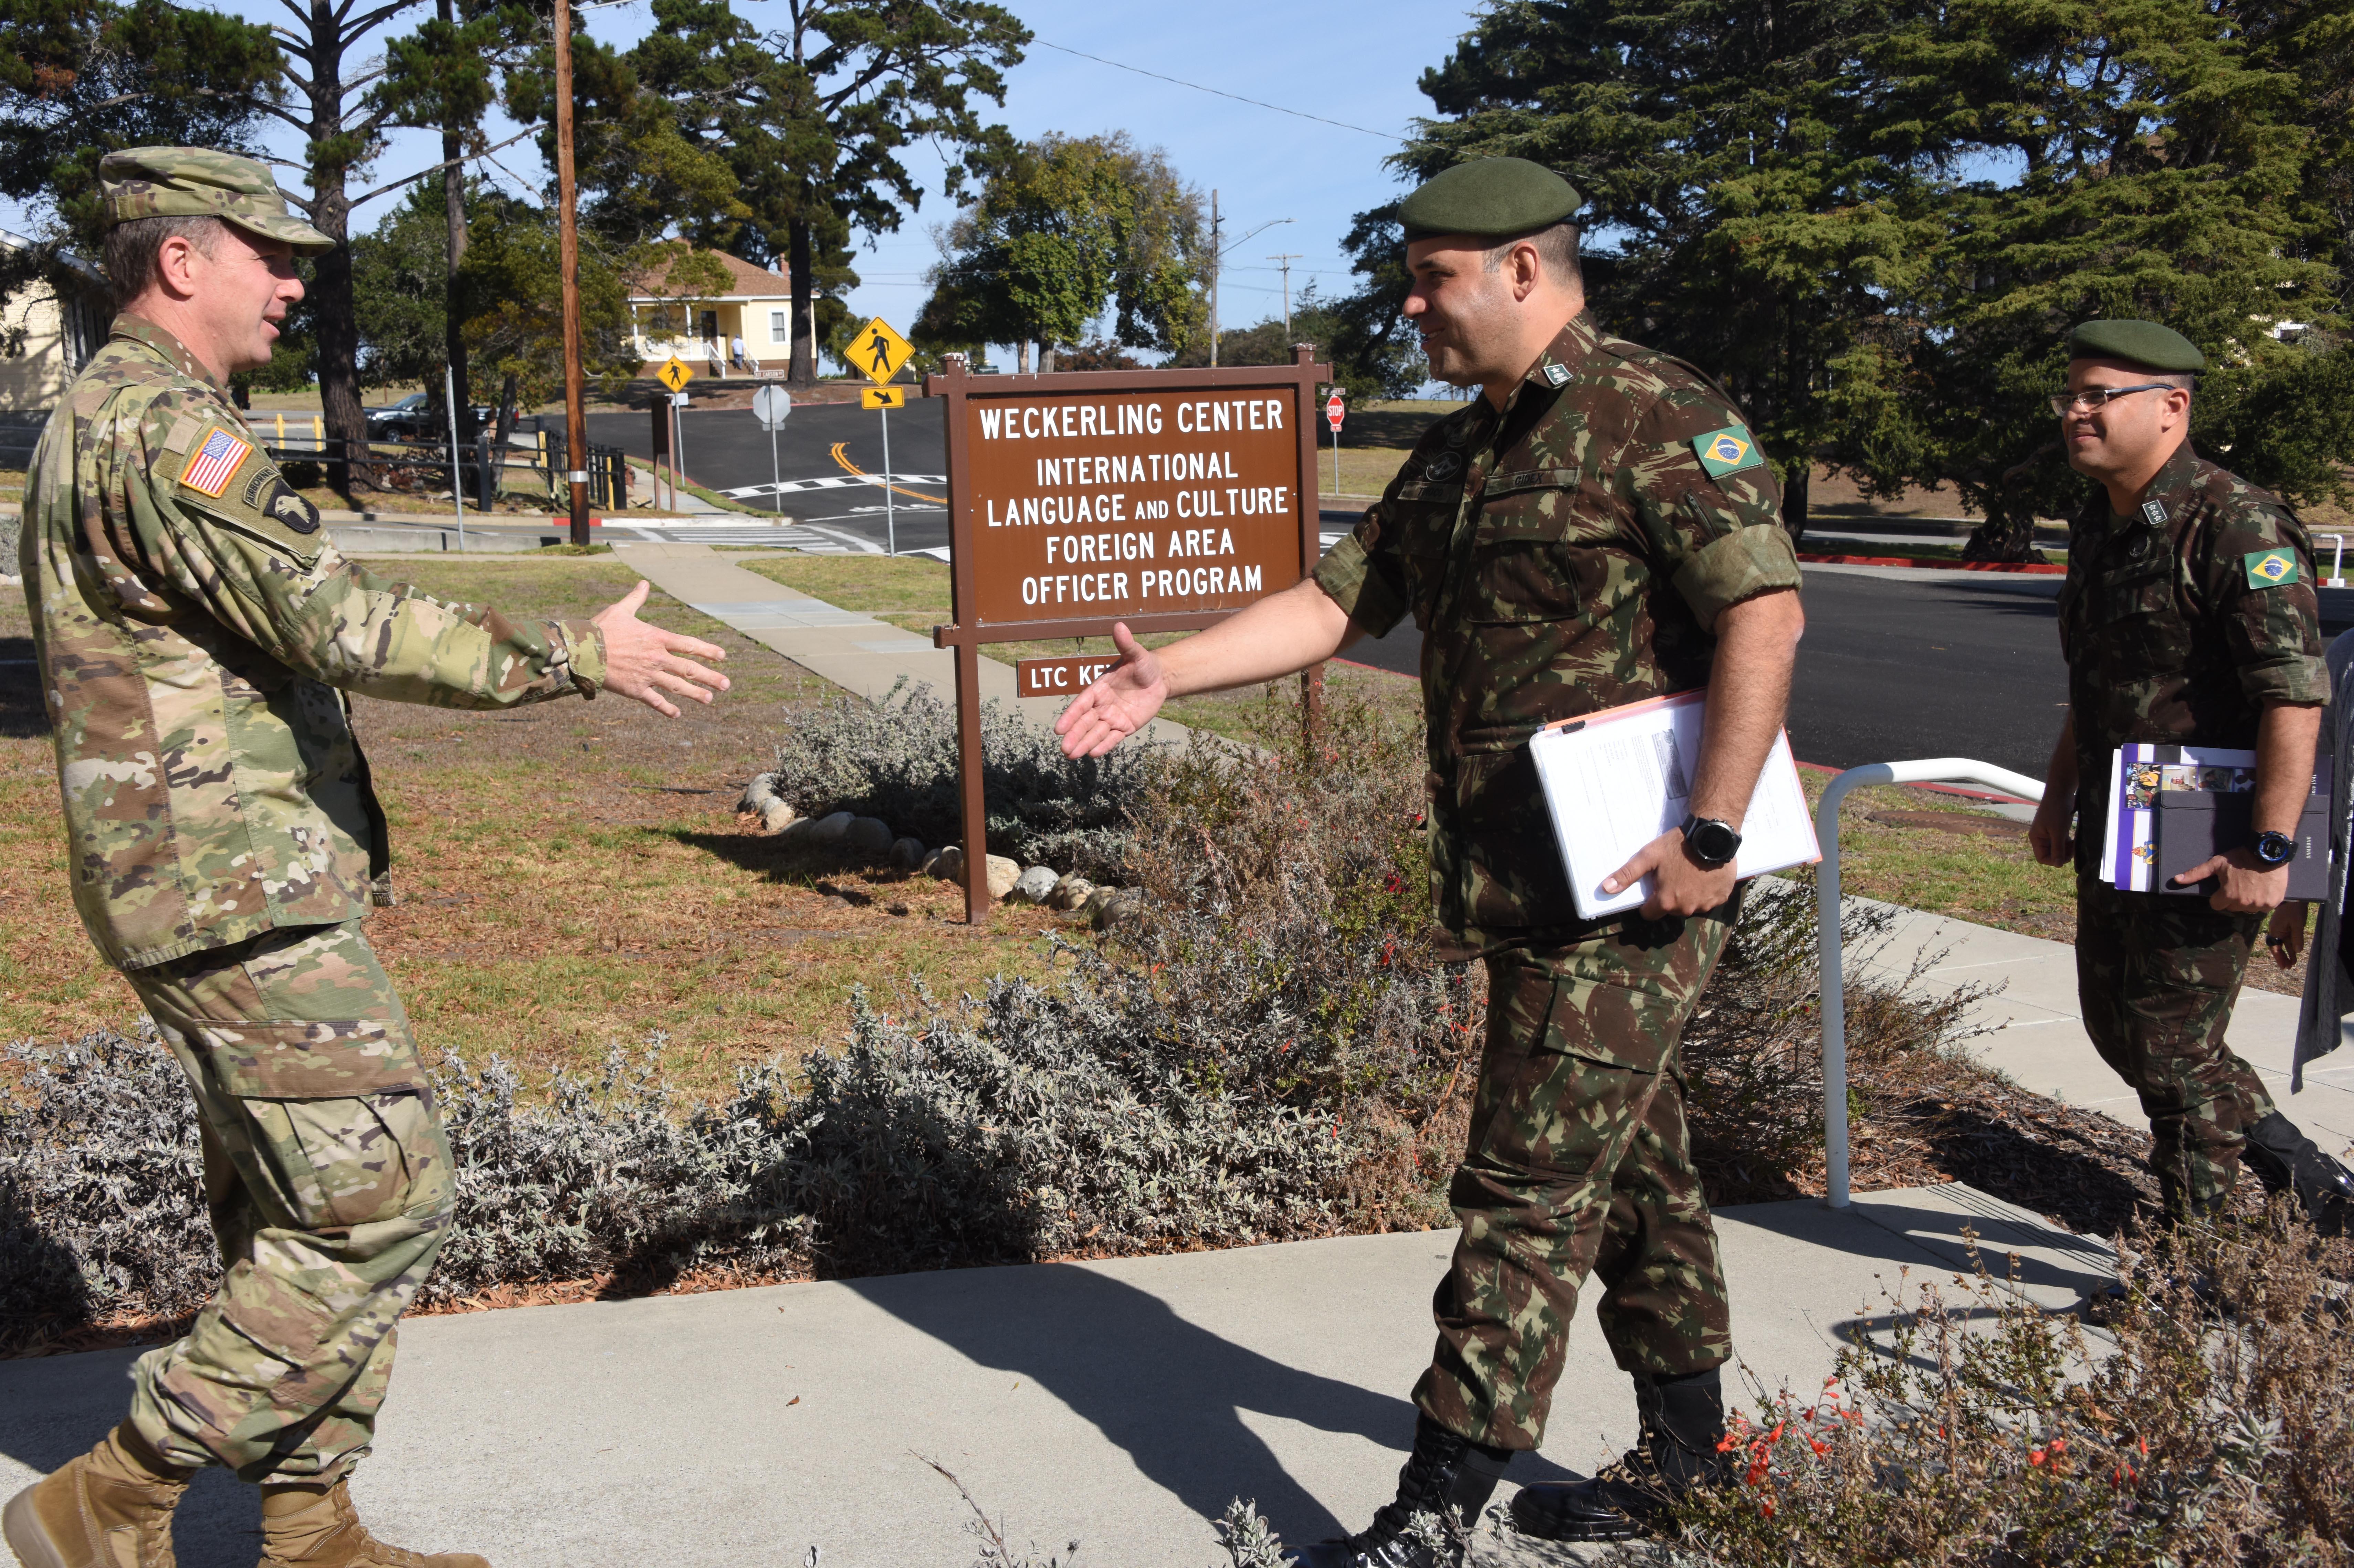 Brazilian Army Language Center officers visit DLIFLC